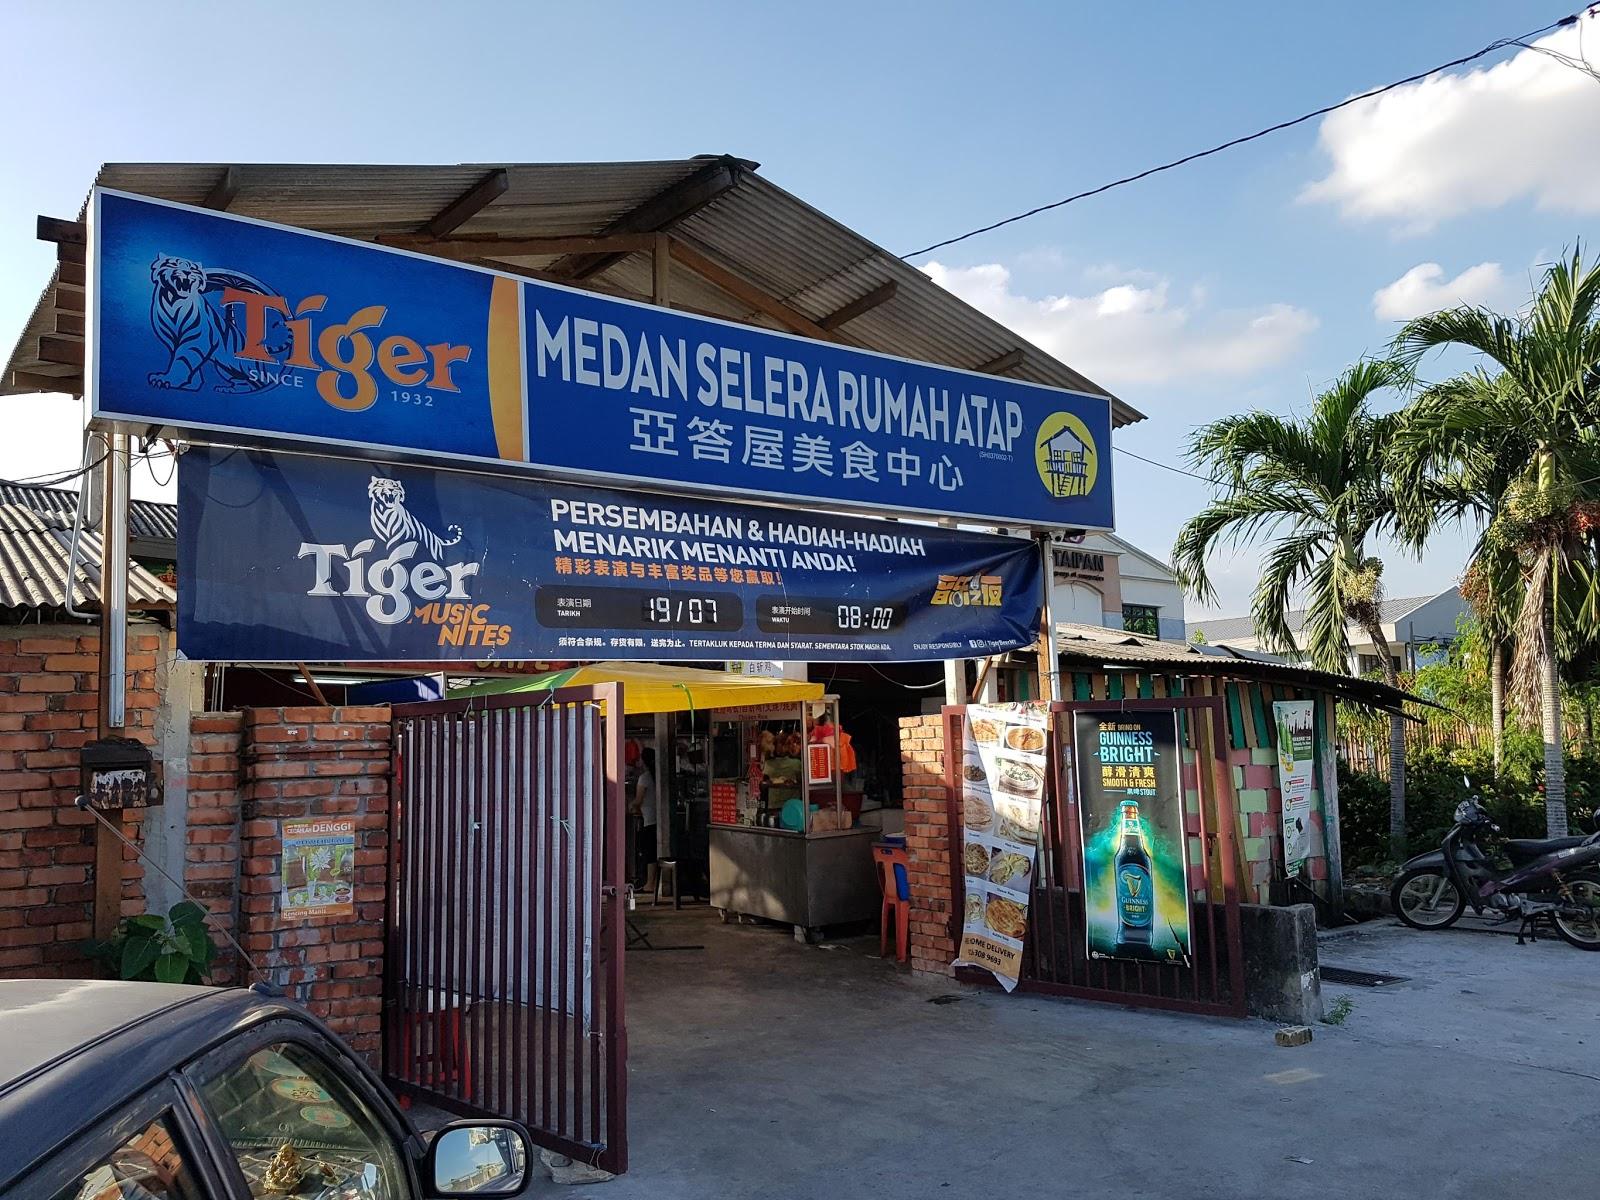 Medan Selera Rumah Atap Indiana Cafe Klang Taman Sri Pesona